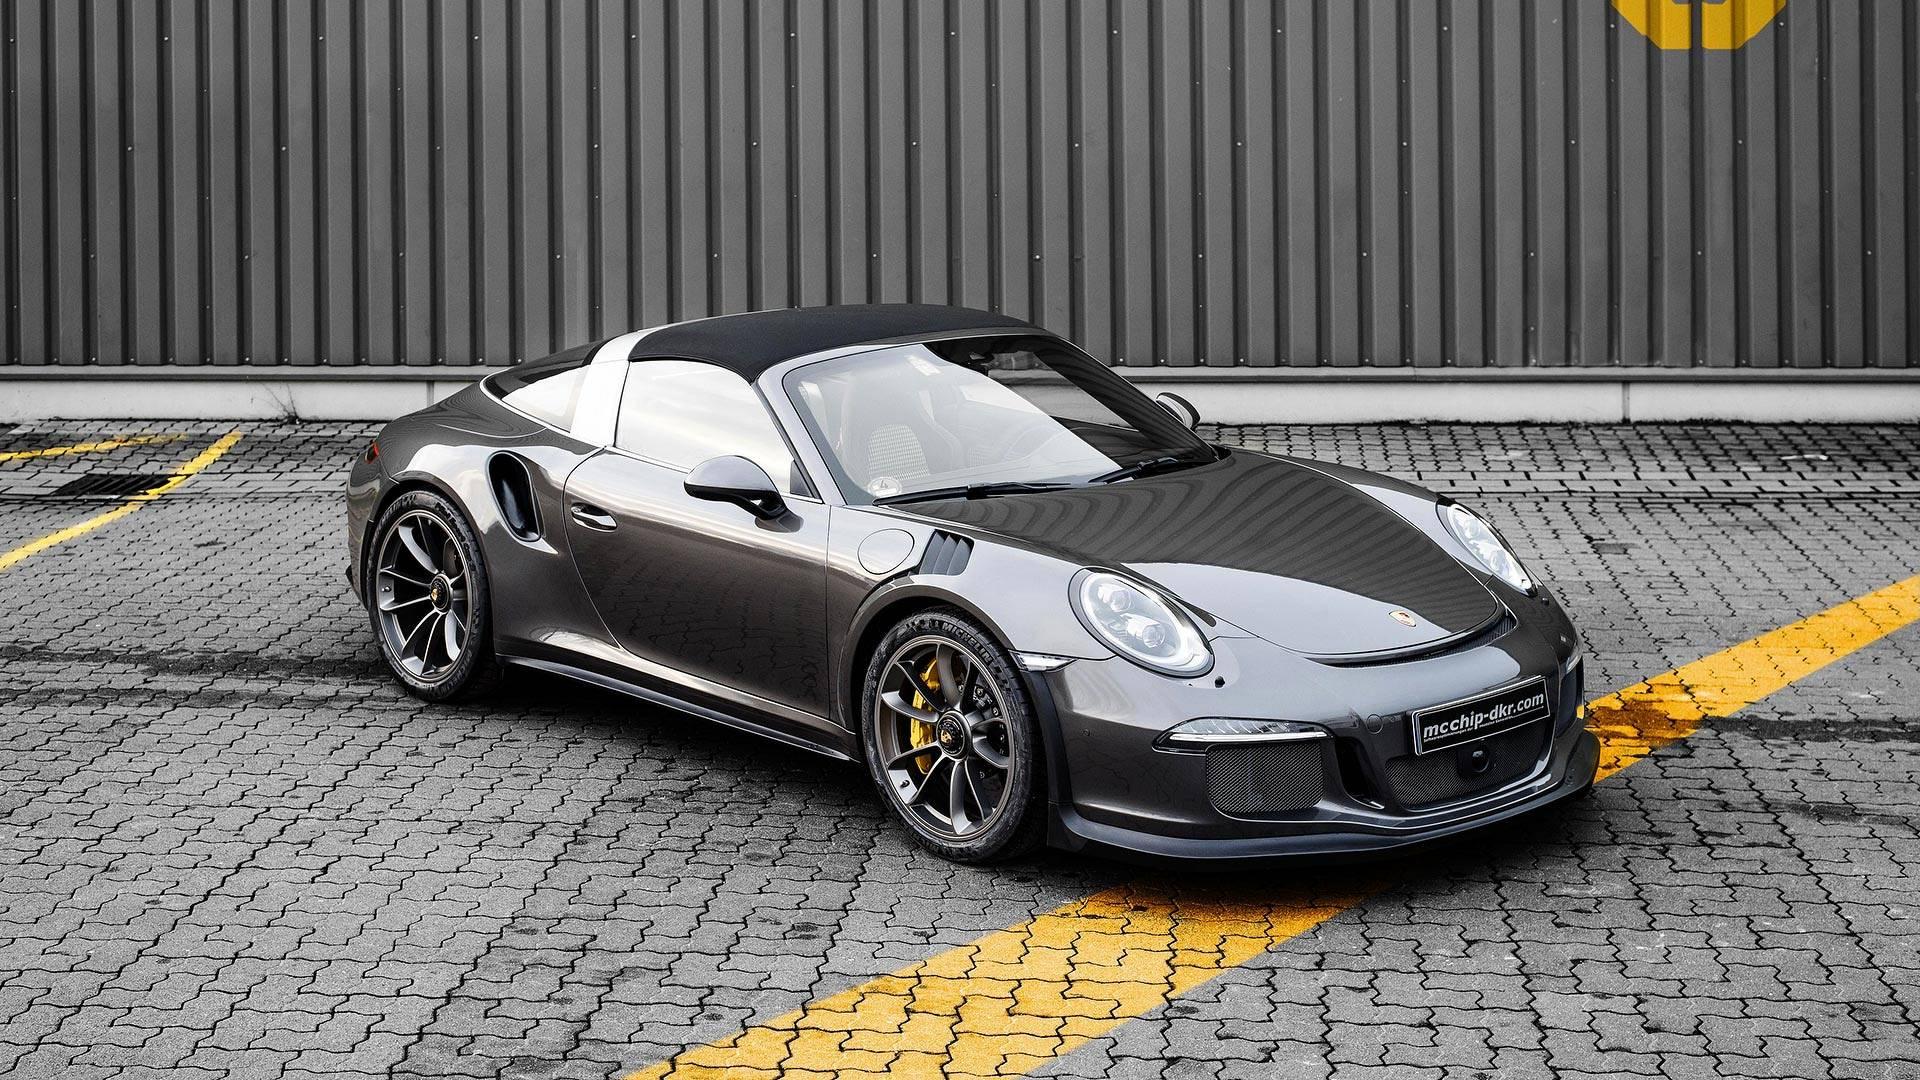 Porsche_911_Targa_GT3_by_Mcchip-dkr_0014